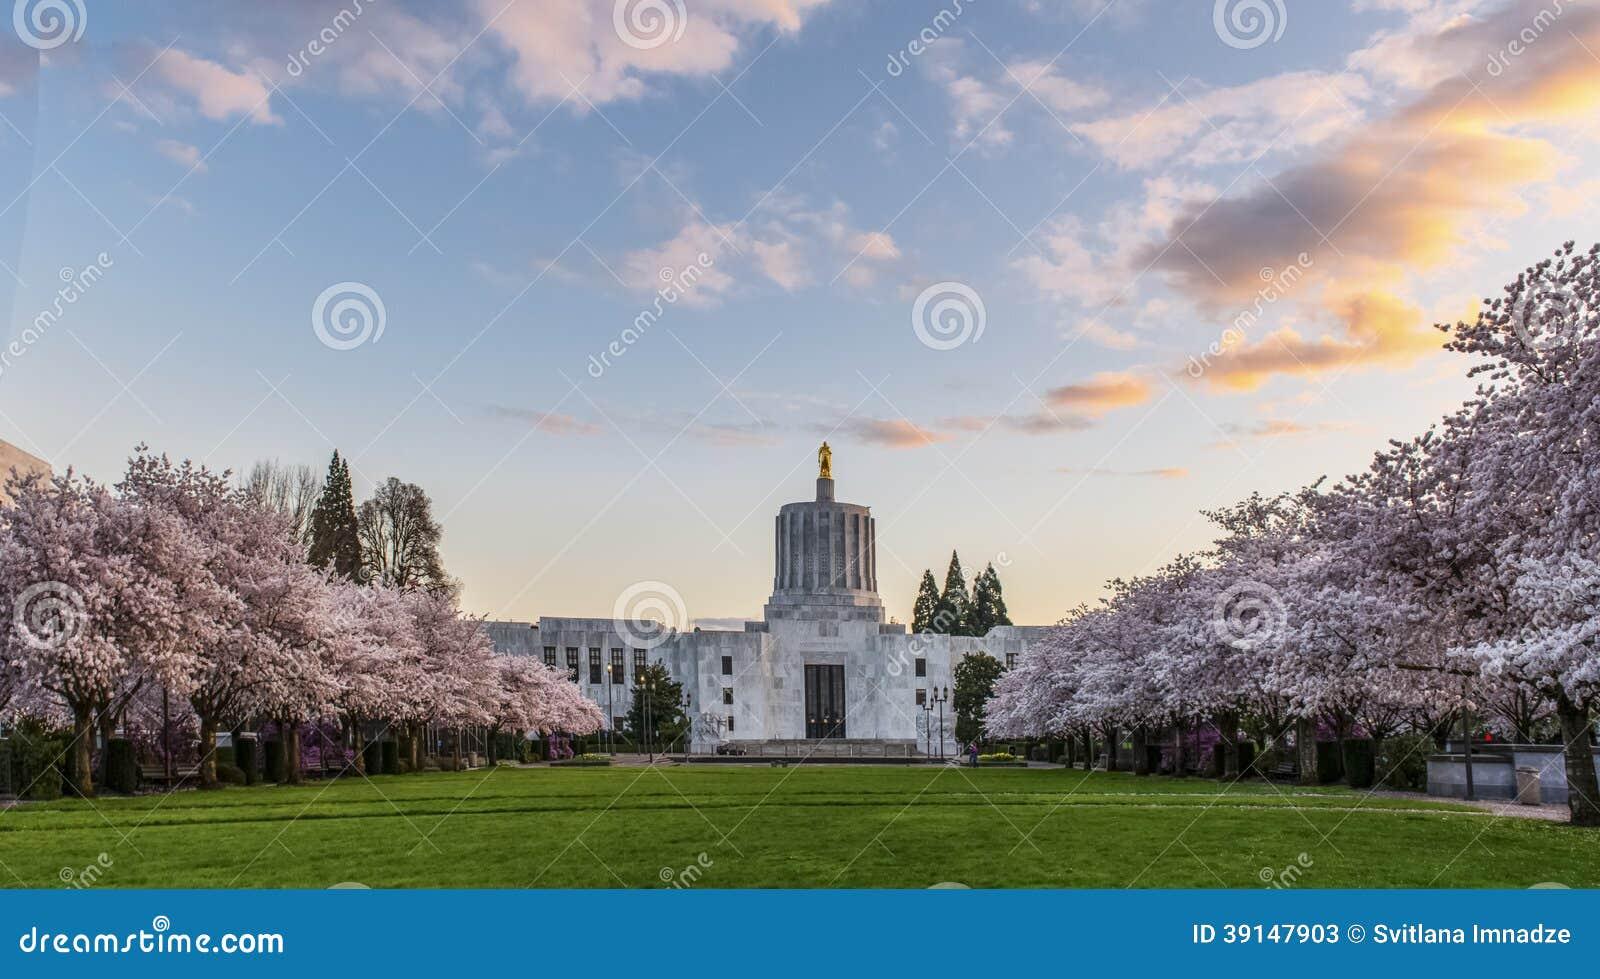 Oregon state capitol salem stock photo image 39147903 for Salem place